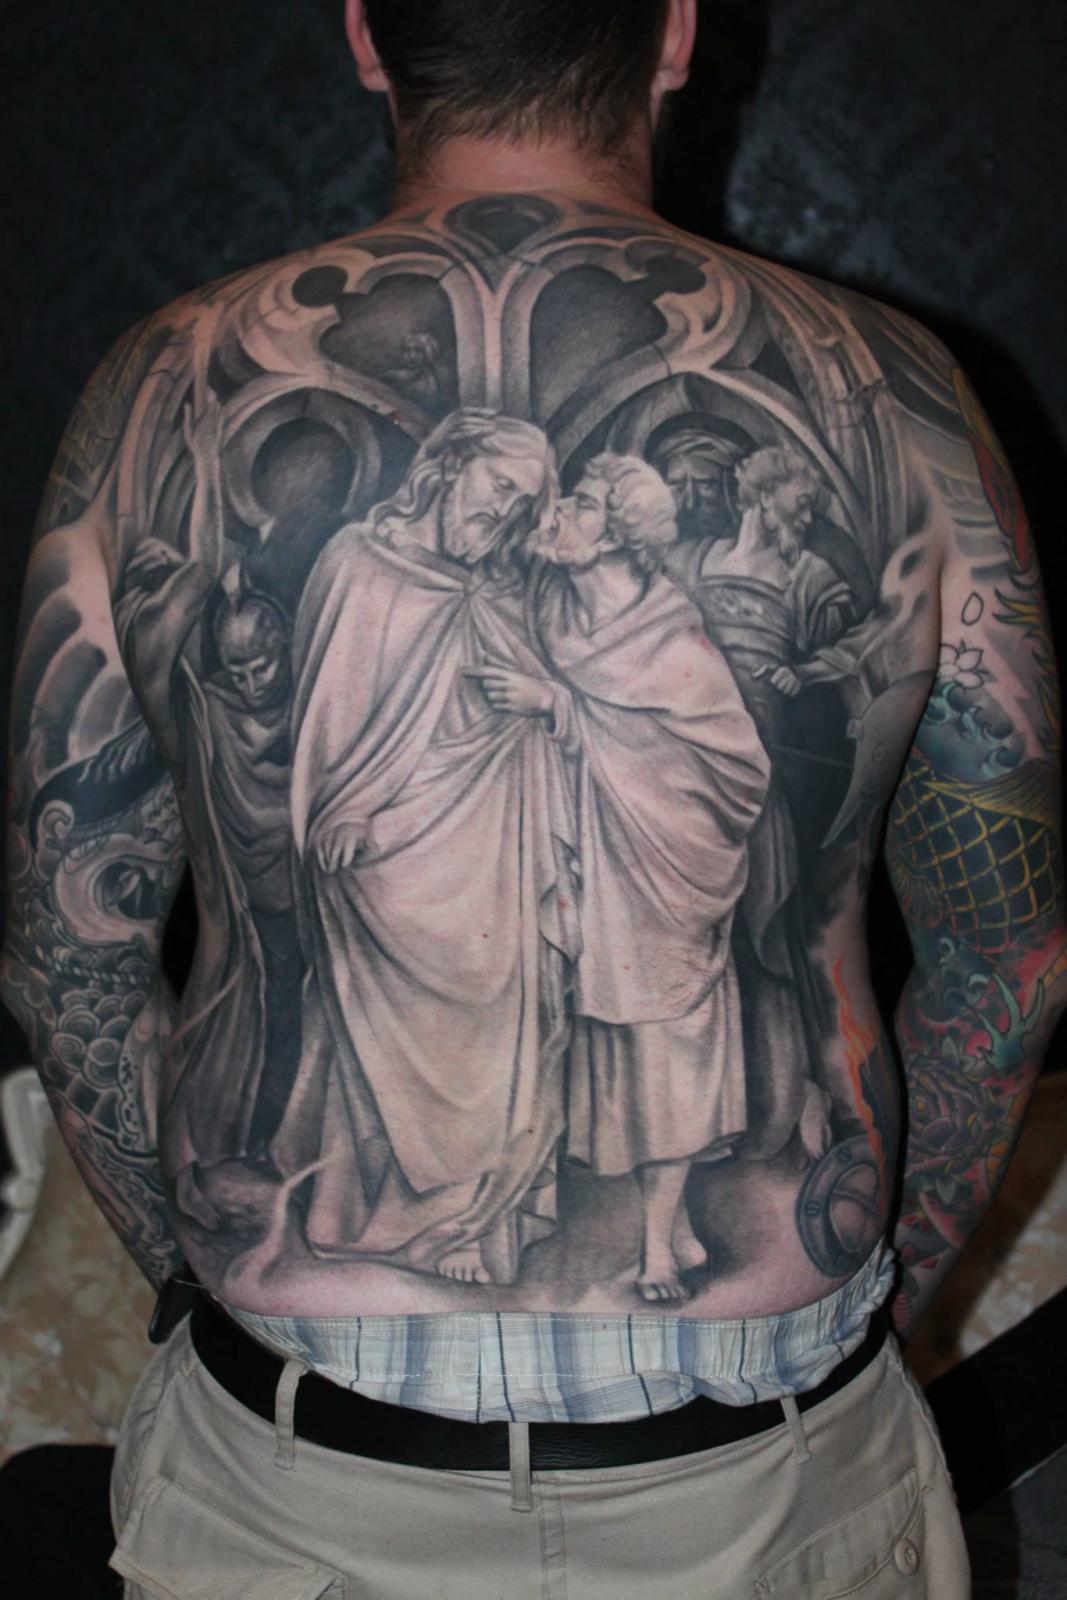 968004d20 Best Tattoo Studios in Ontario - Tattoo.com